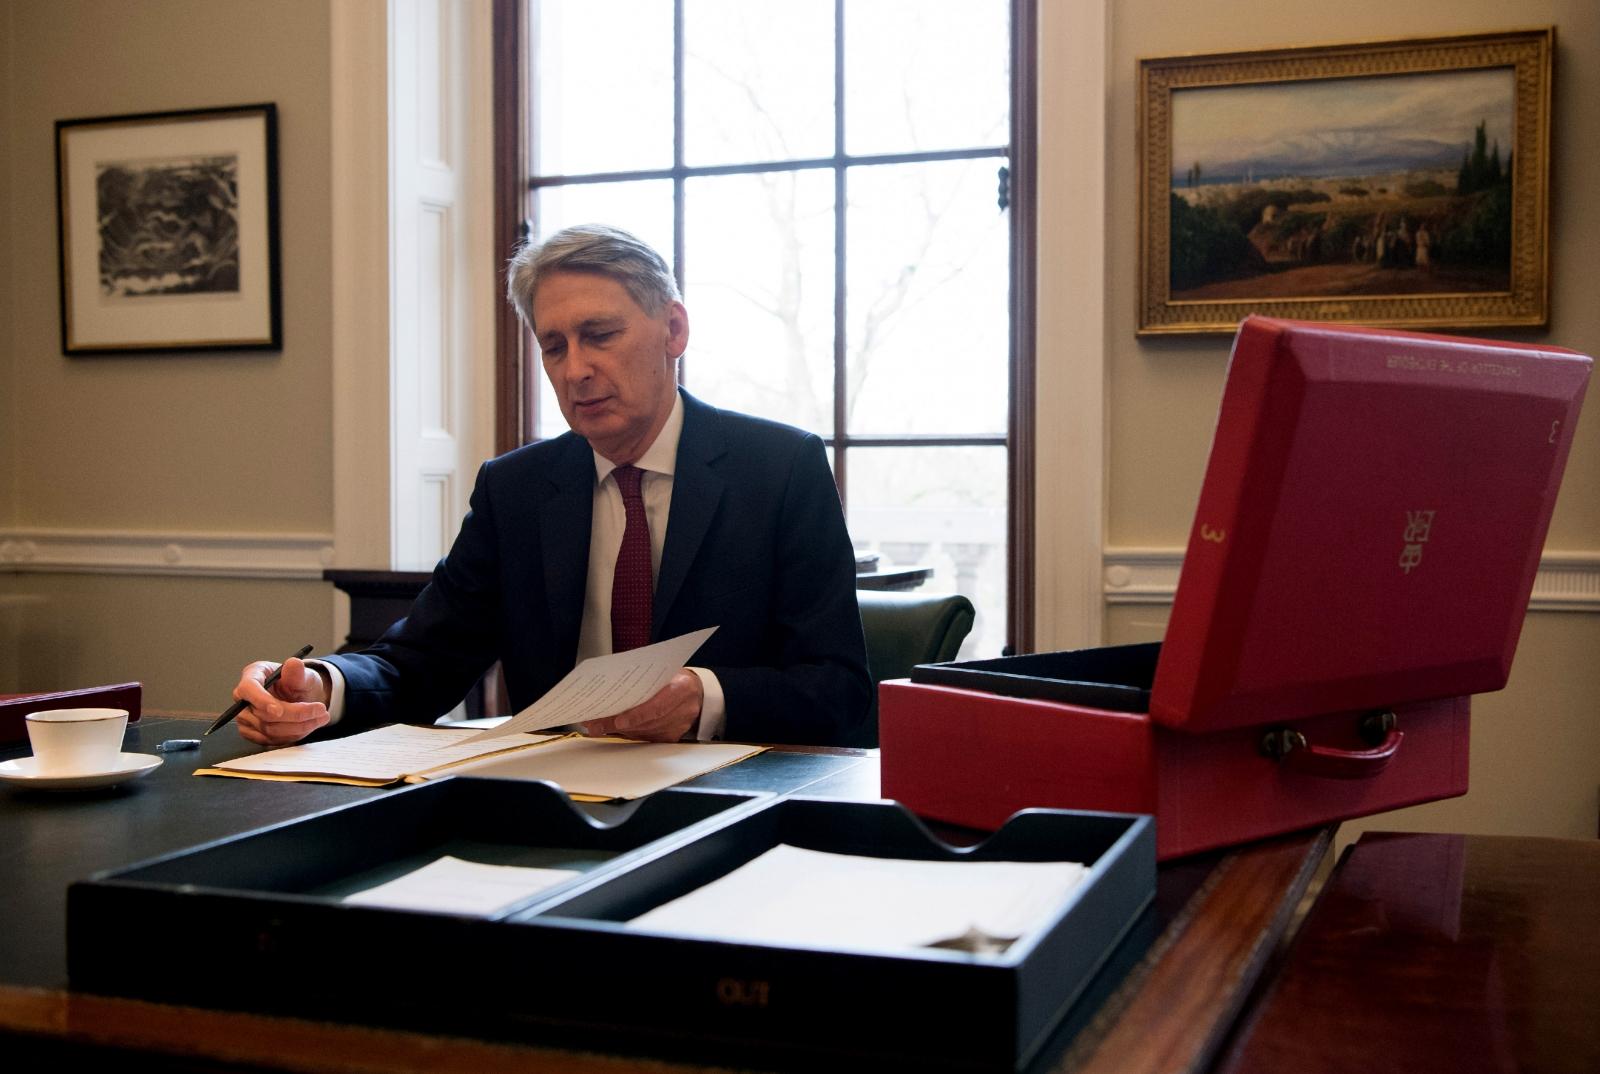 Budget 2017 Chancellor Philip Hammond